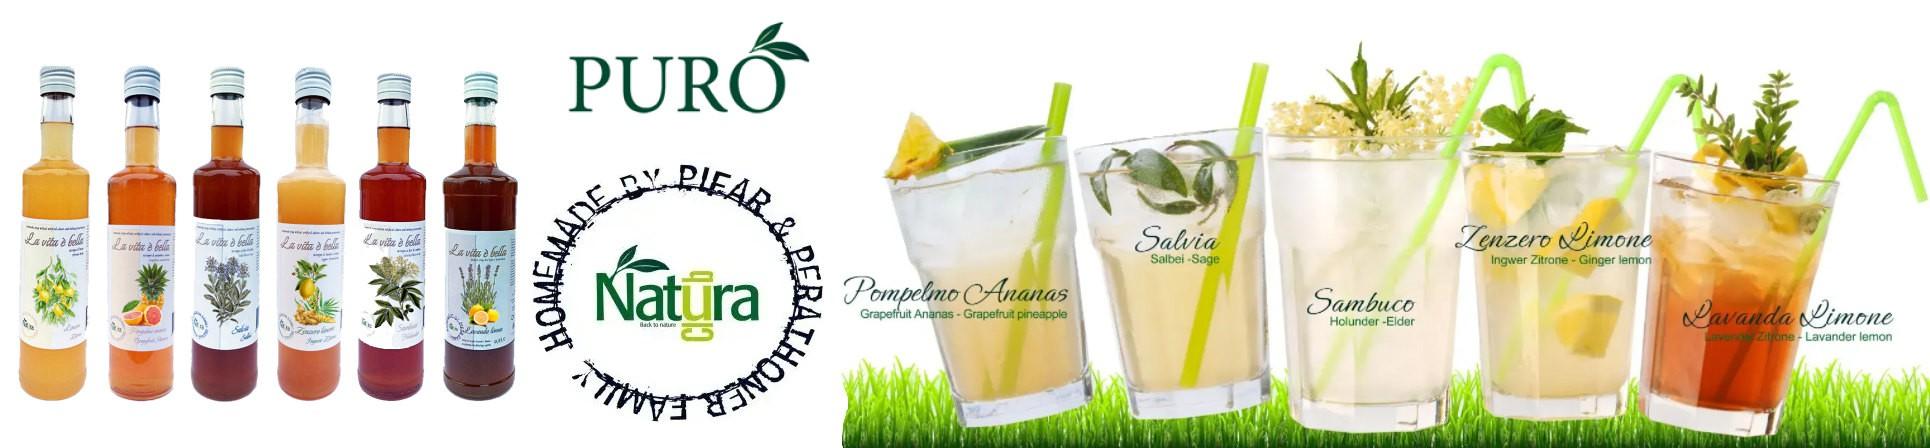 Sciroppi artigianali vendita online drinks estratti vegetali e naturali, bevande funzionali - PURO DRINKS NATURA